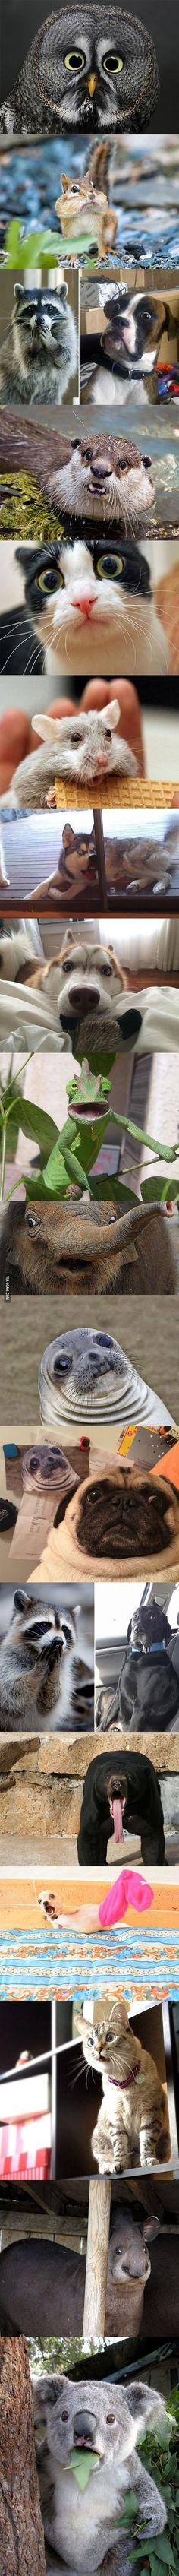 Animals in complete astonishment